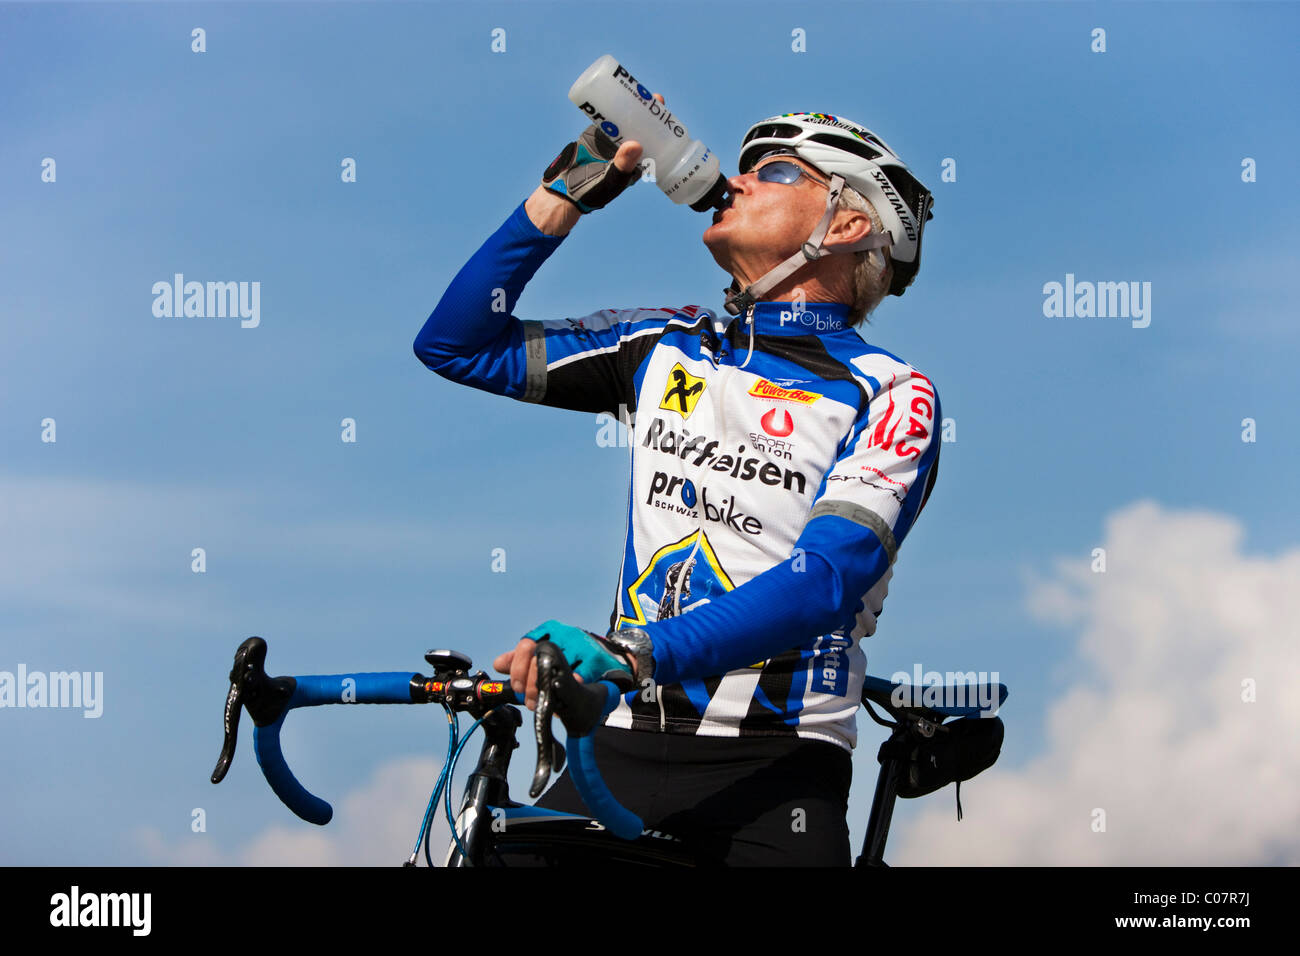 Agile senior ciclismo, acqua potabile Immagini Stock